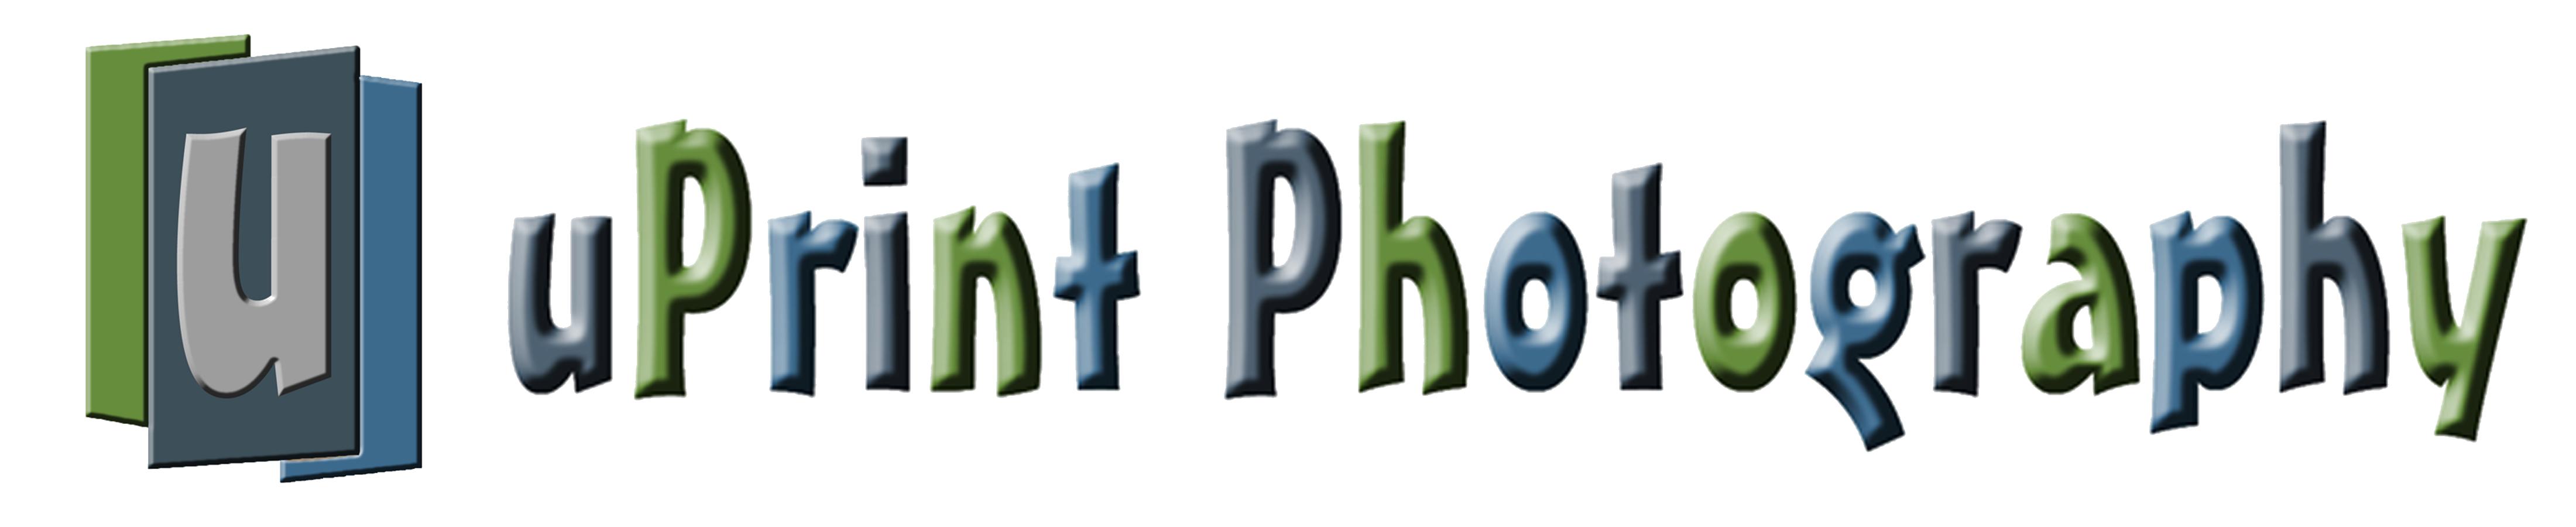 uPrint Photography